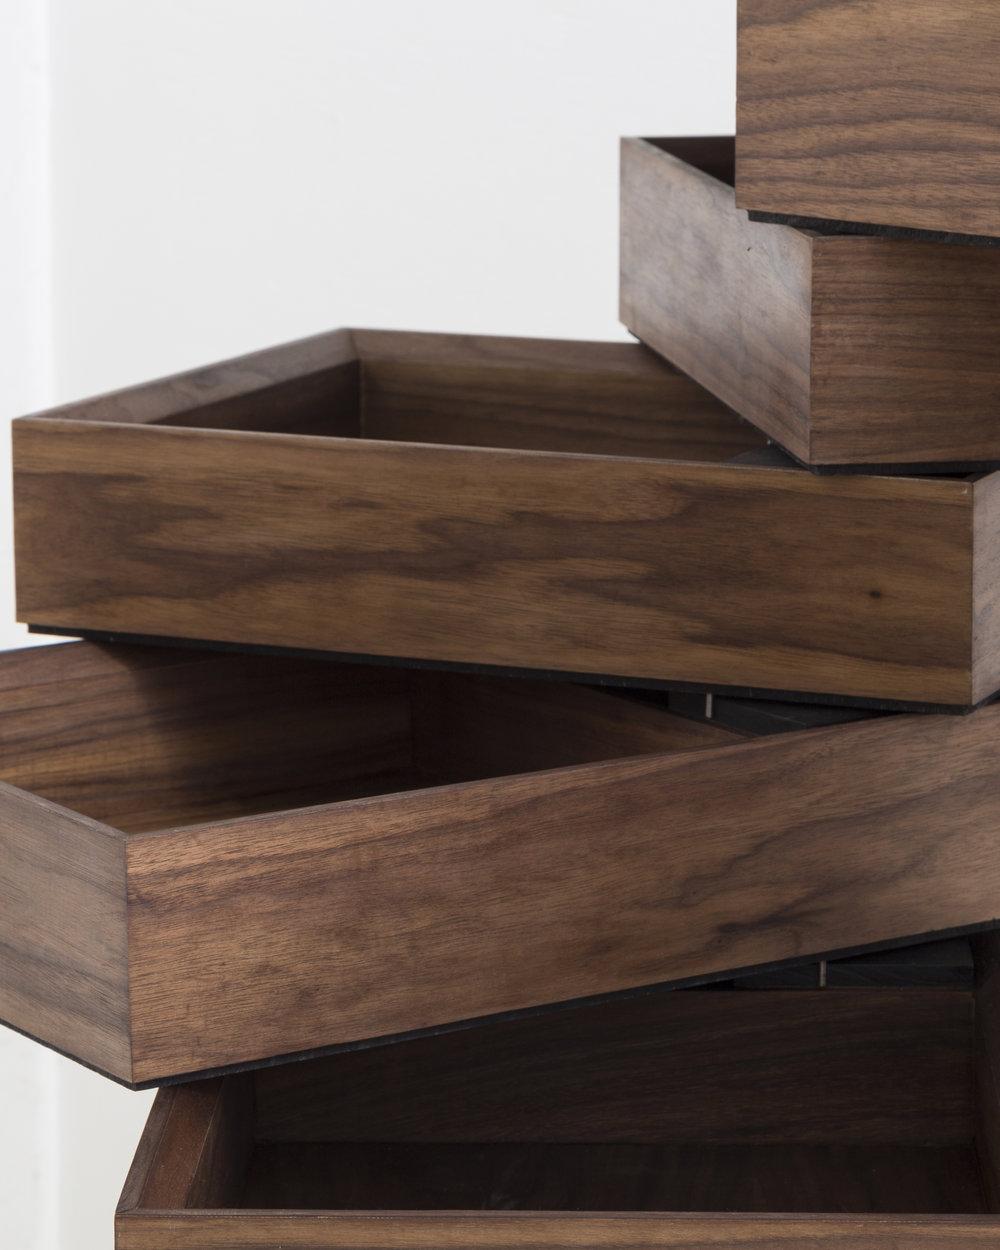 Spin Cabinet 13.jpg